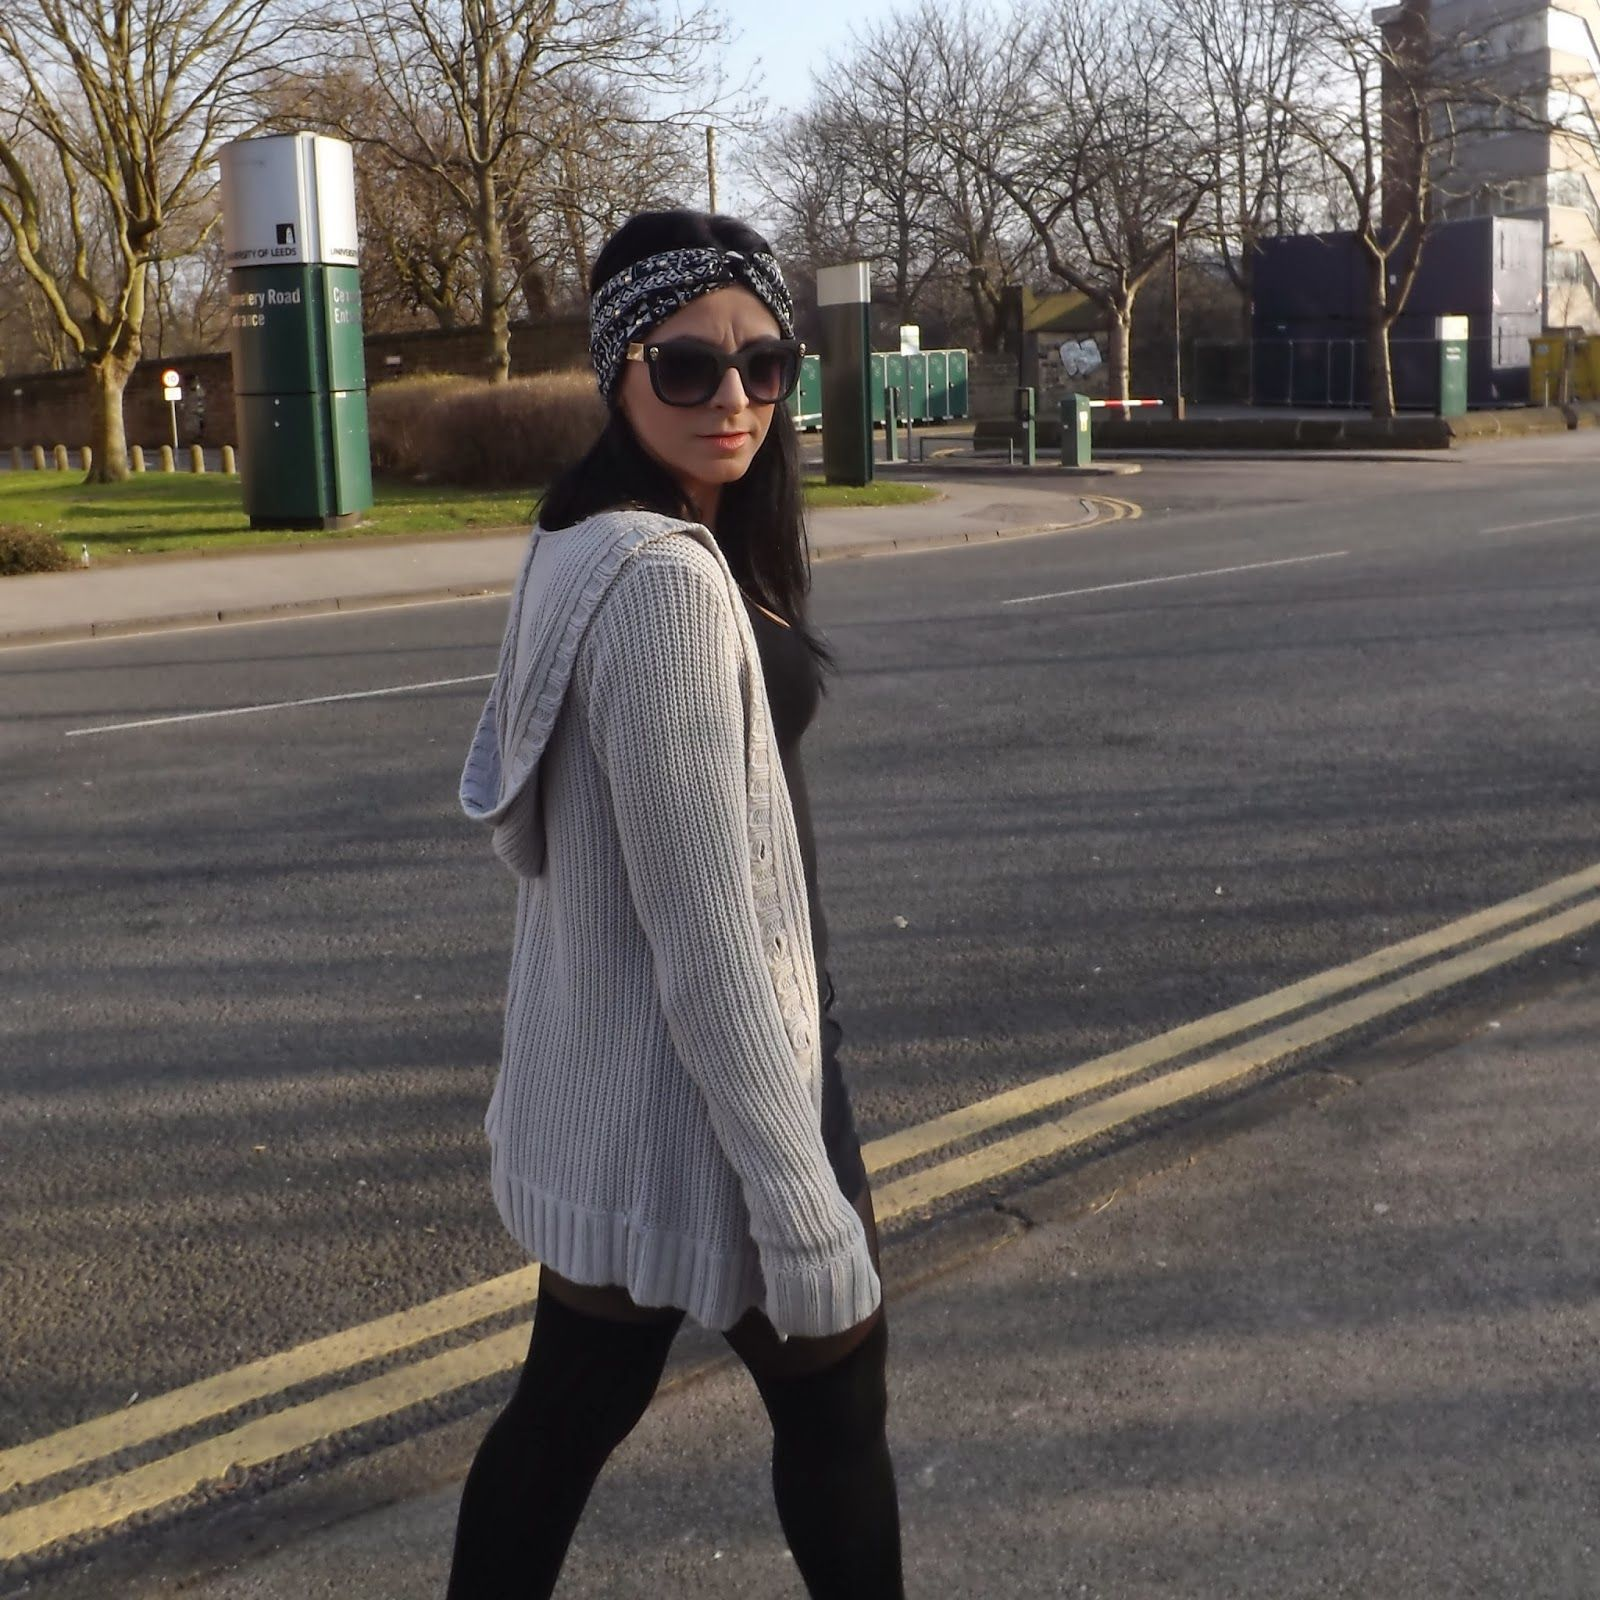 my fashion blog: Os primeiros raios de sol - já cheira a Primavera